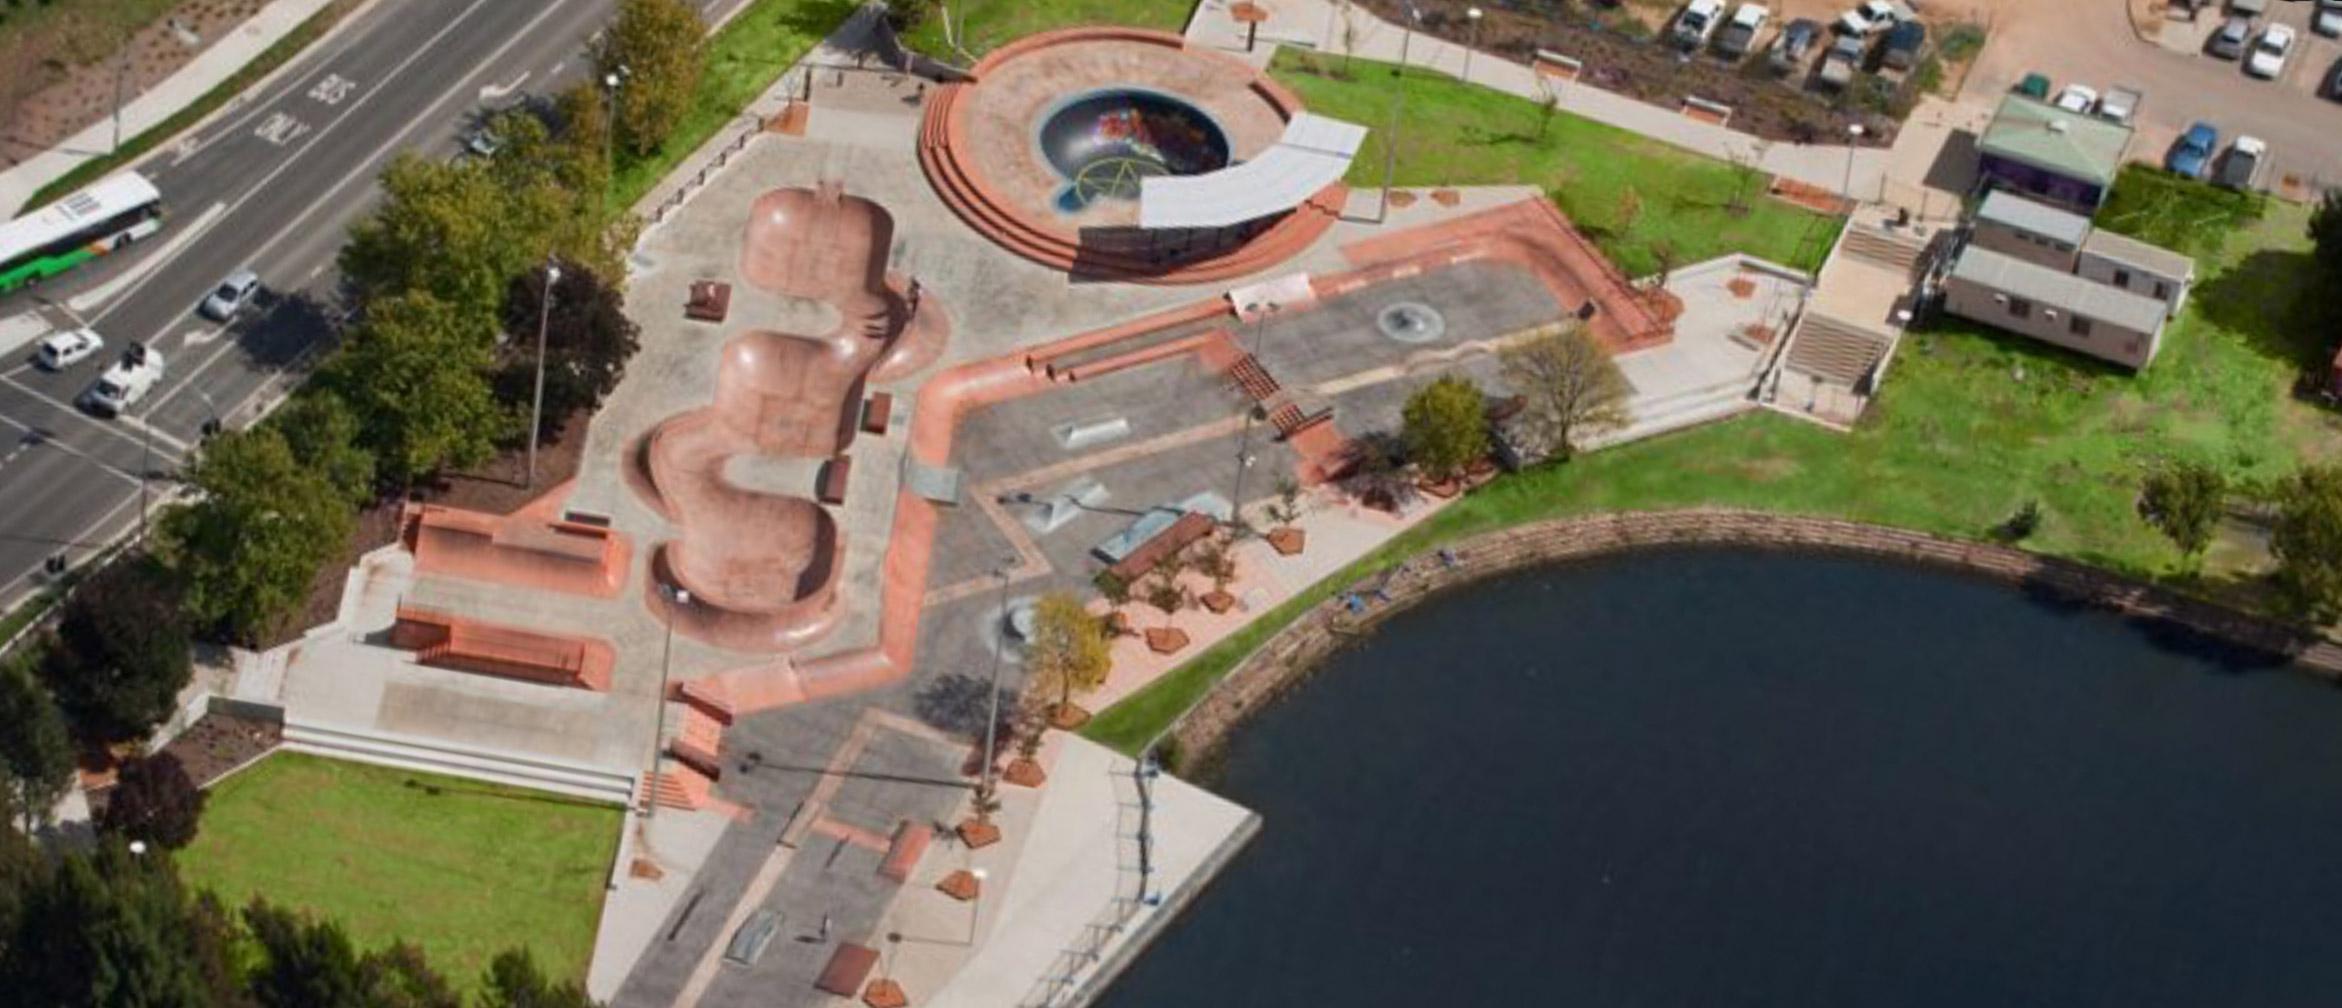 Belconnen skate park overview